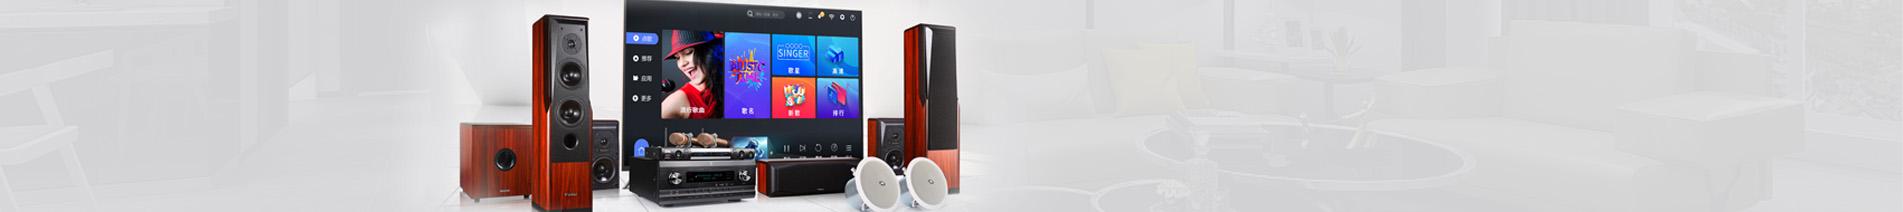 UmaxView智能影音-珠海-激光电视|家庭影院|HIFI音响|家庭娱乐体验中心-全宅定制智能影音娱乐解决方案